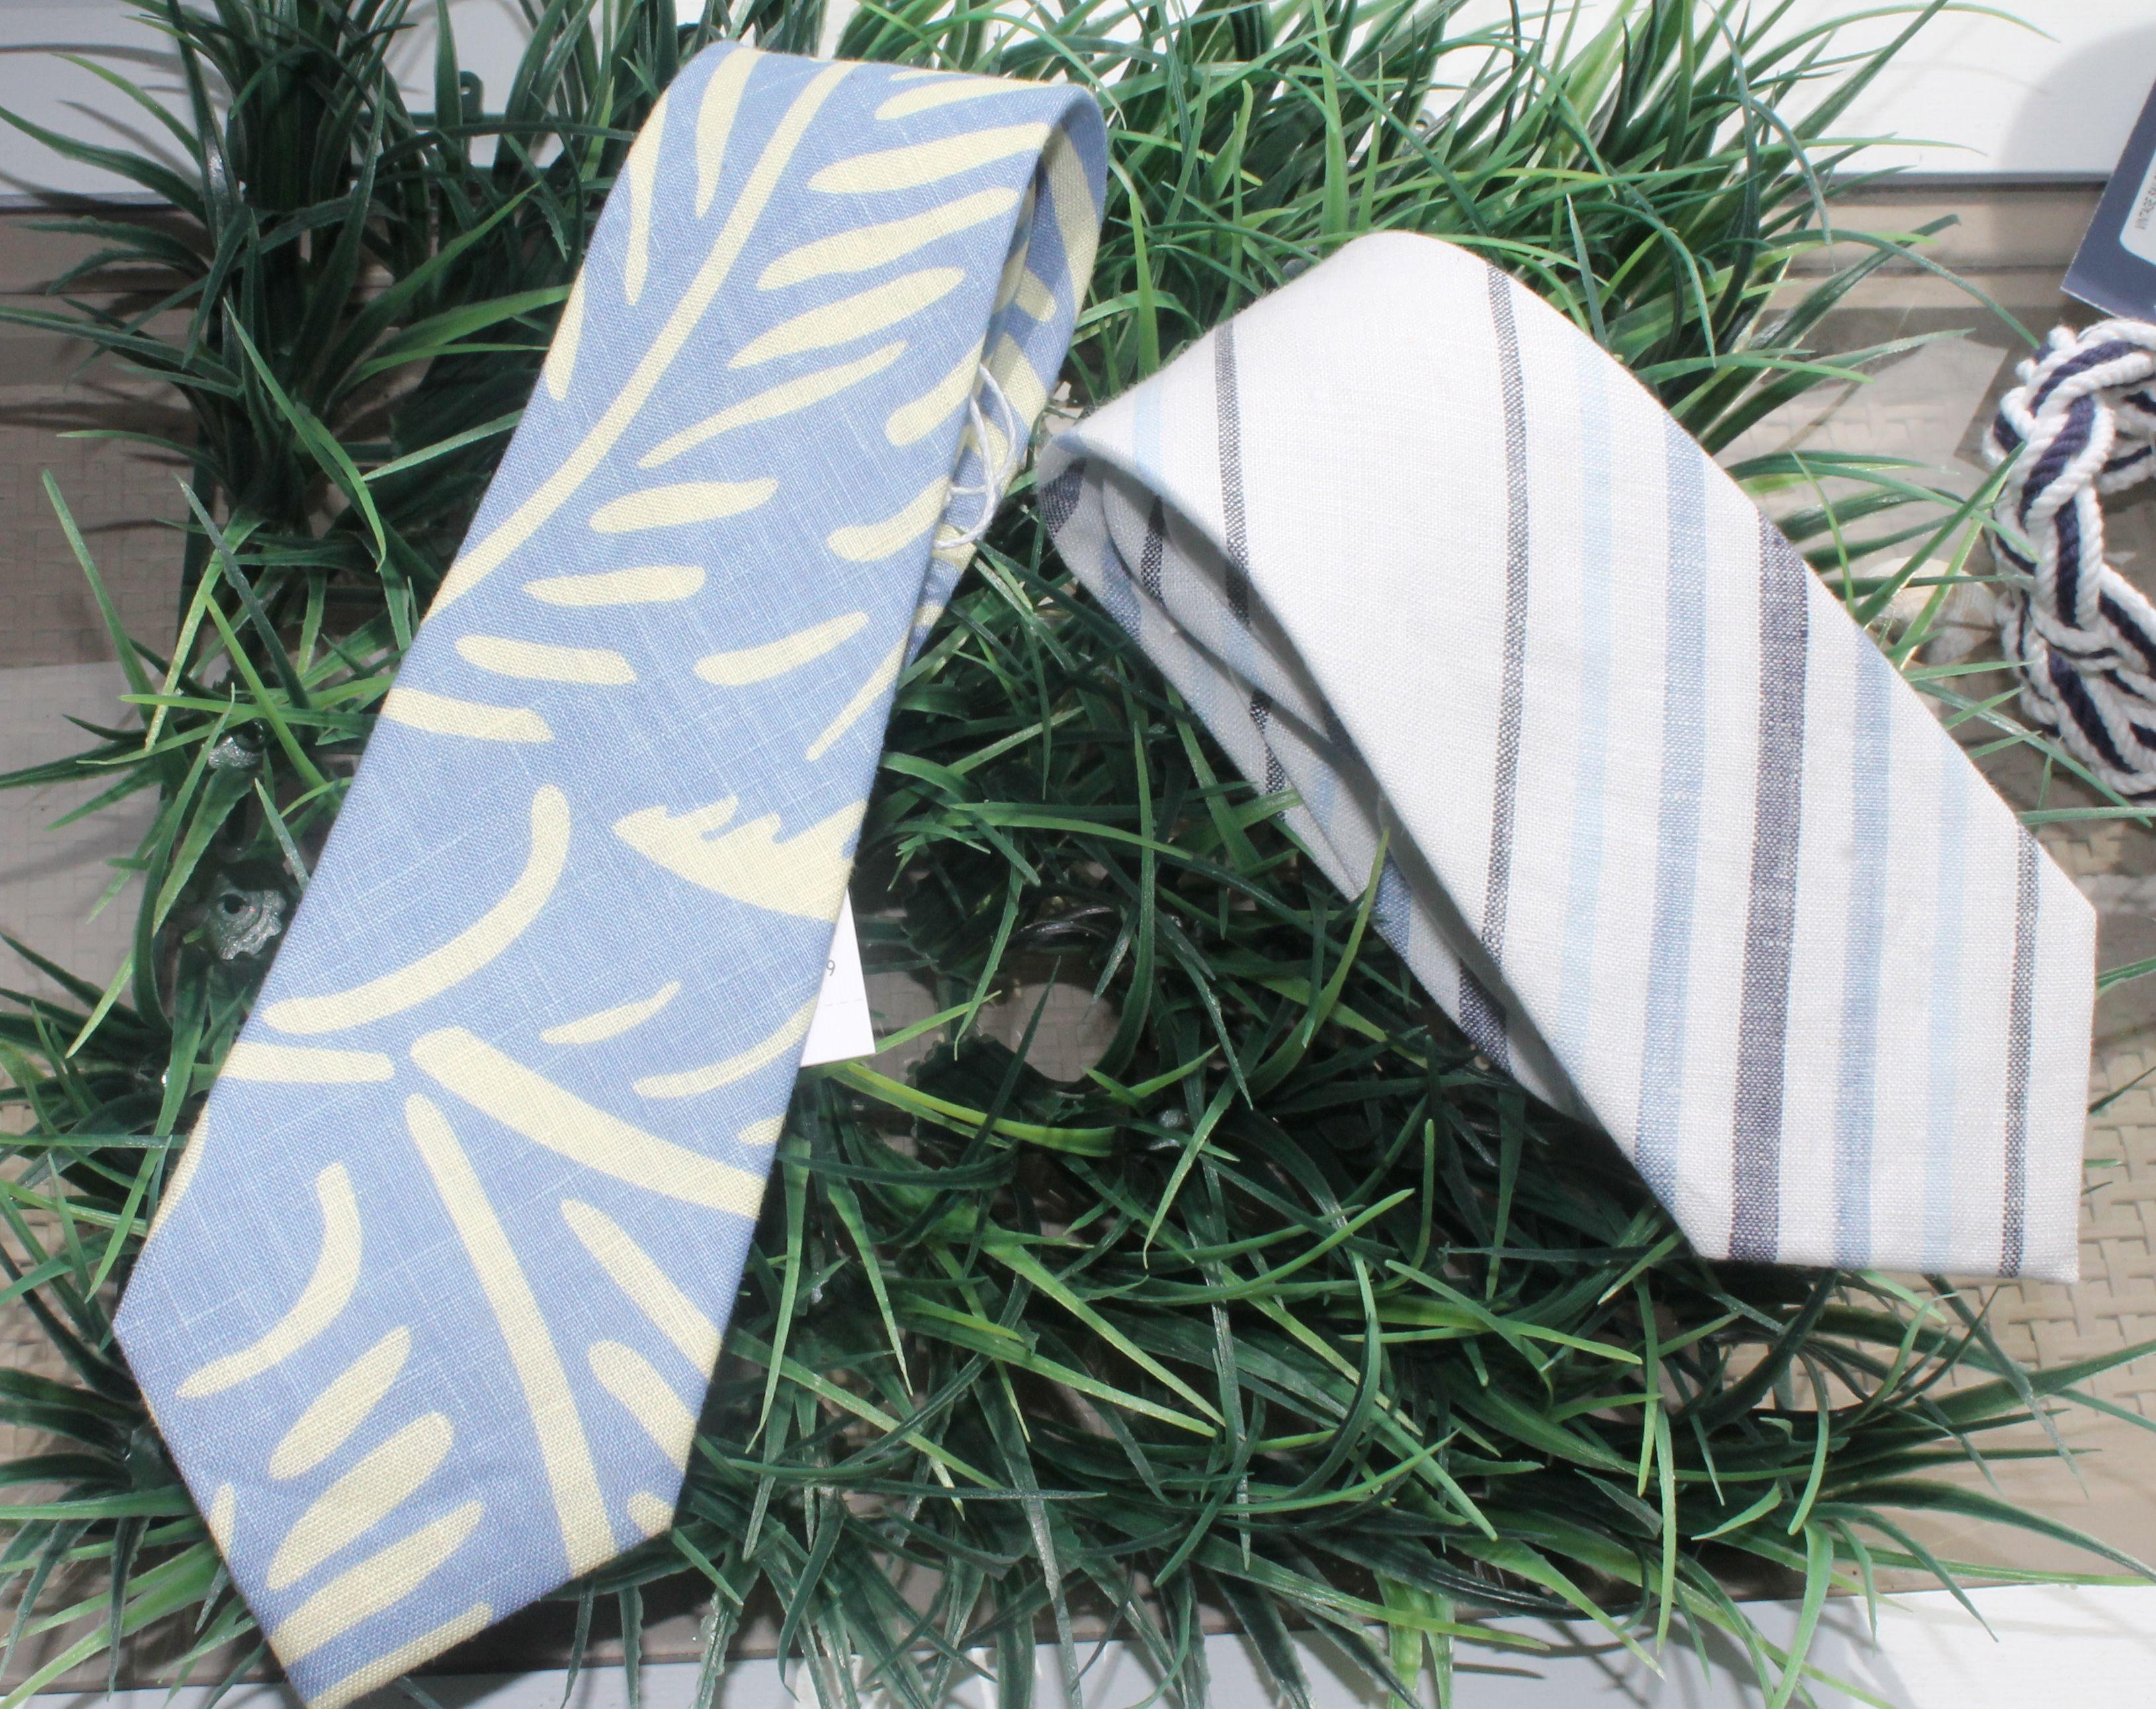 Island Company. Linen ties.